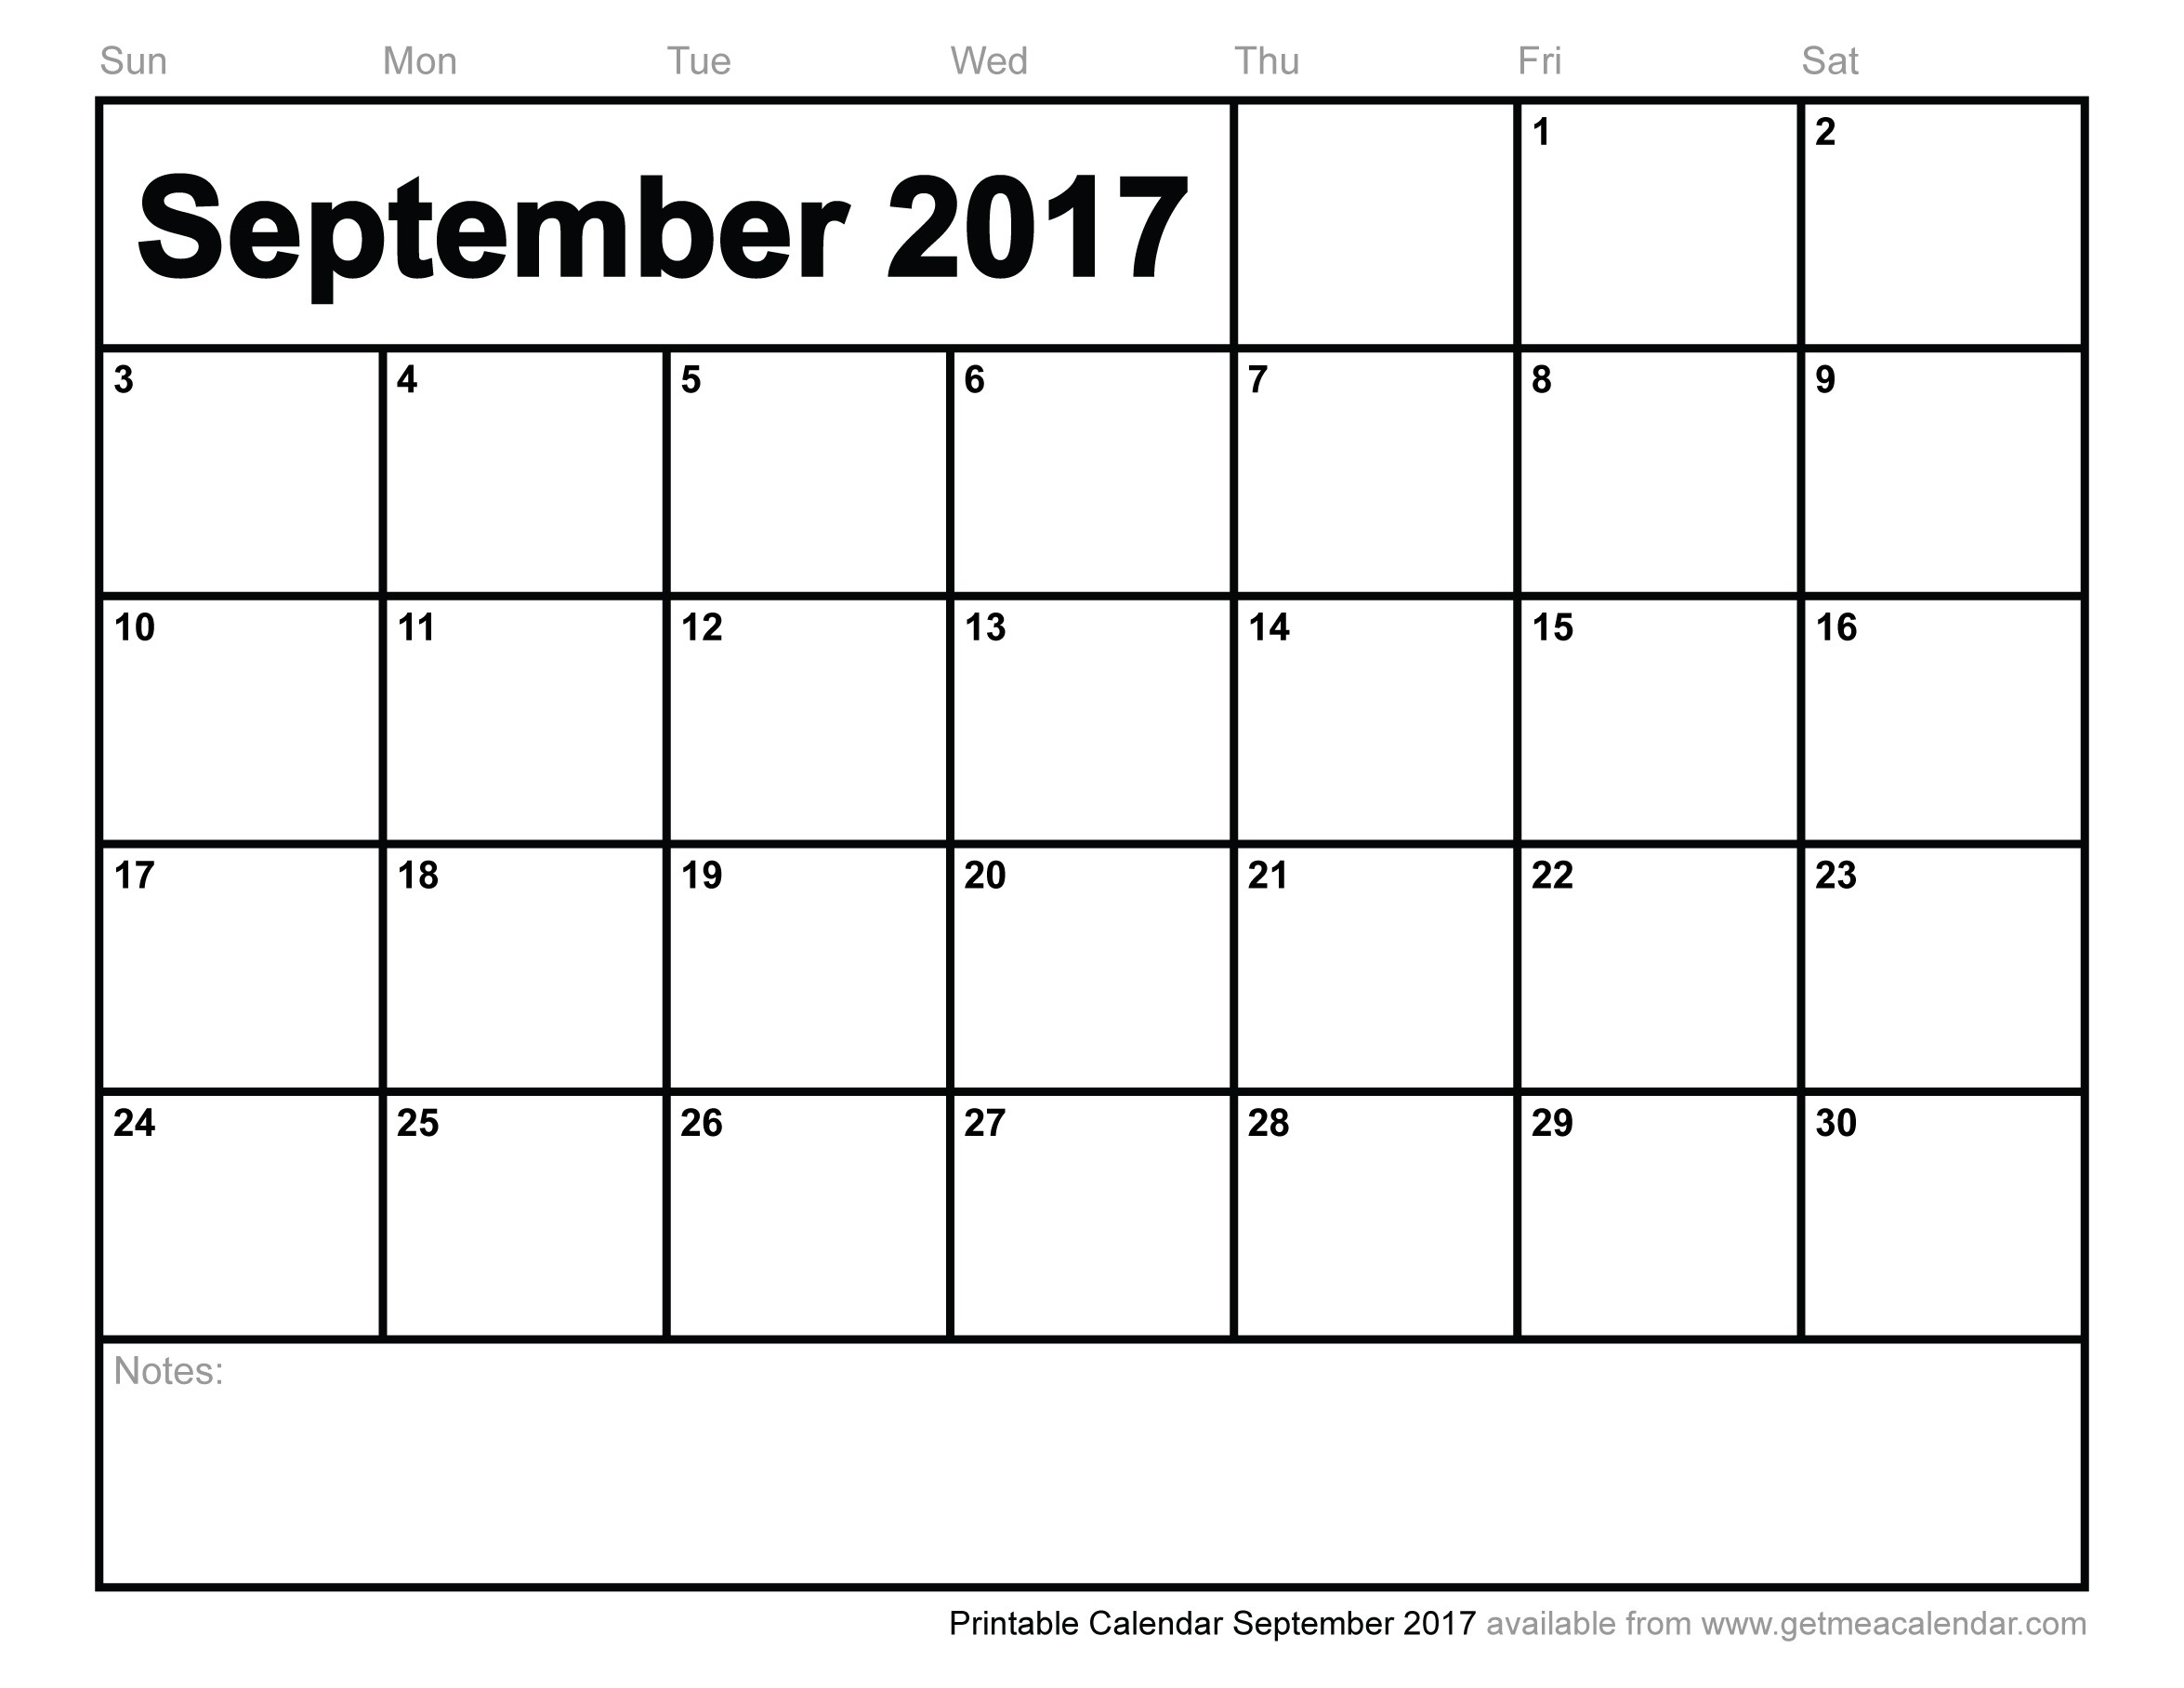 Printable Calendar September 2017-Blank Printable Catholic Calender September